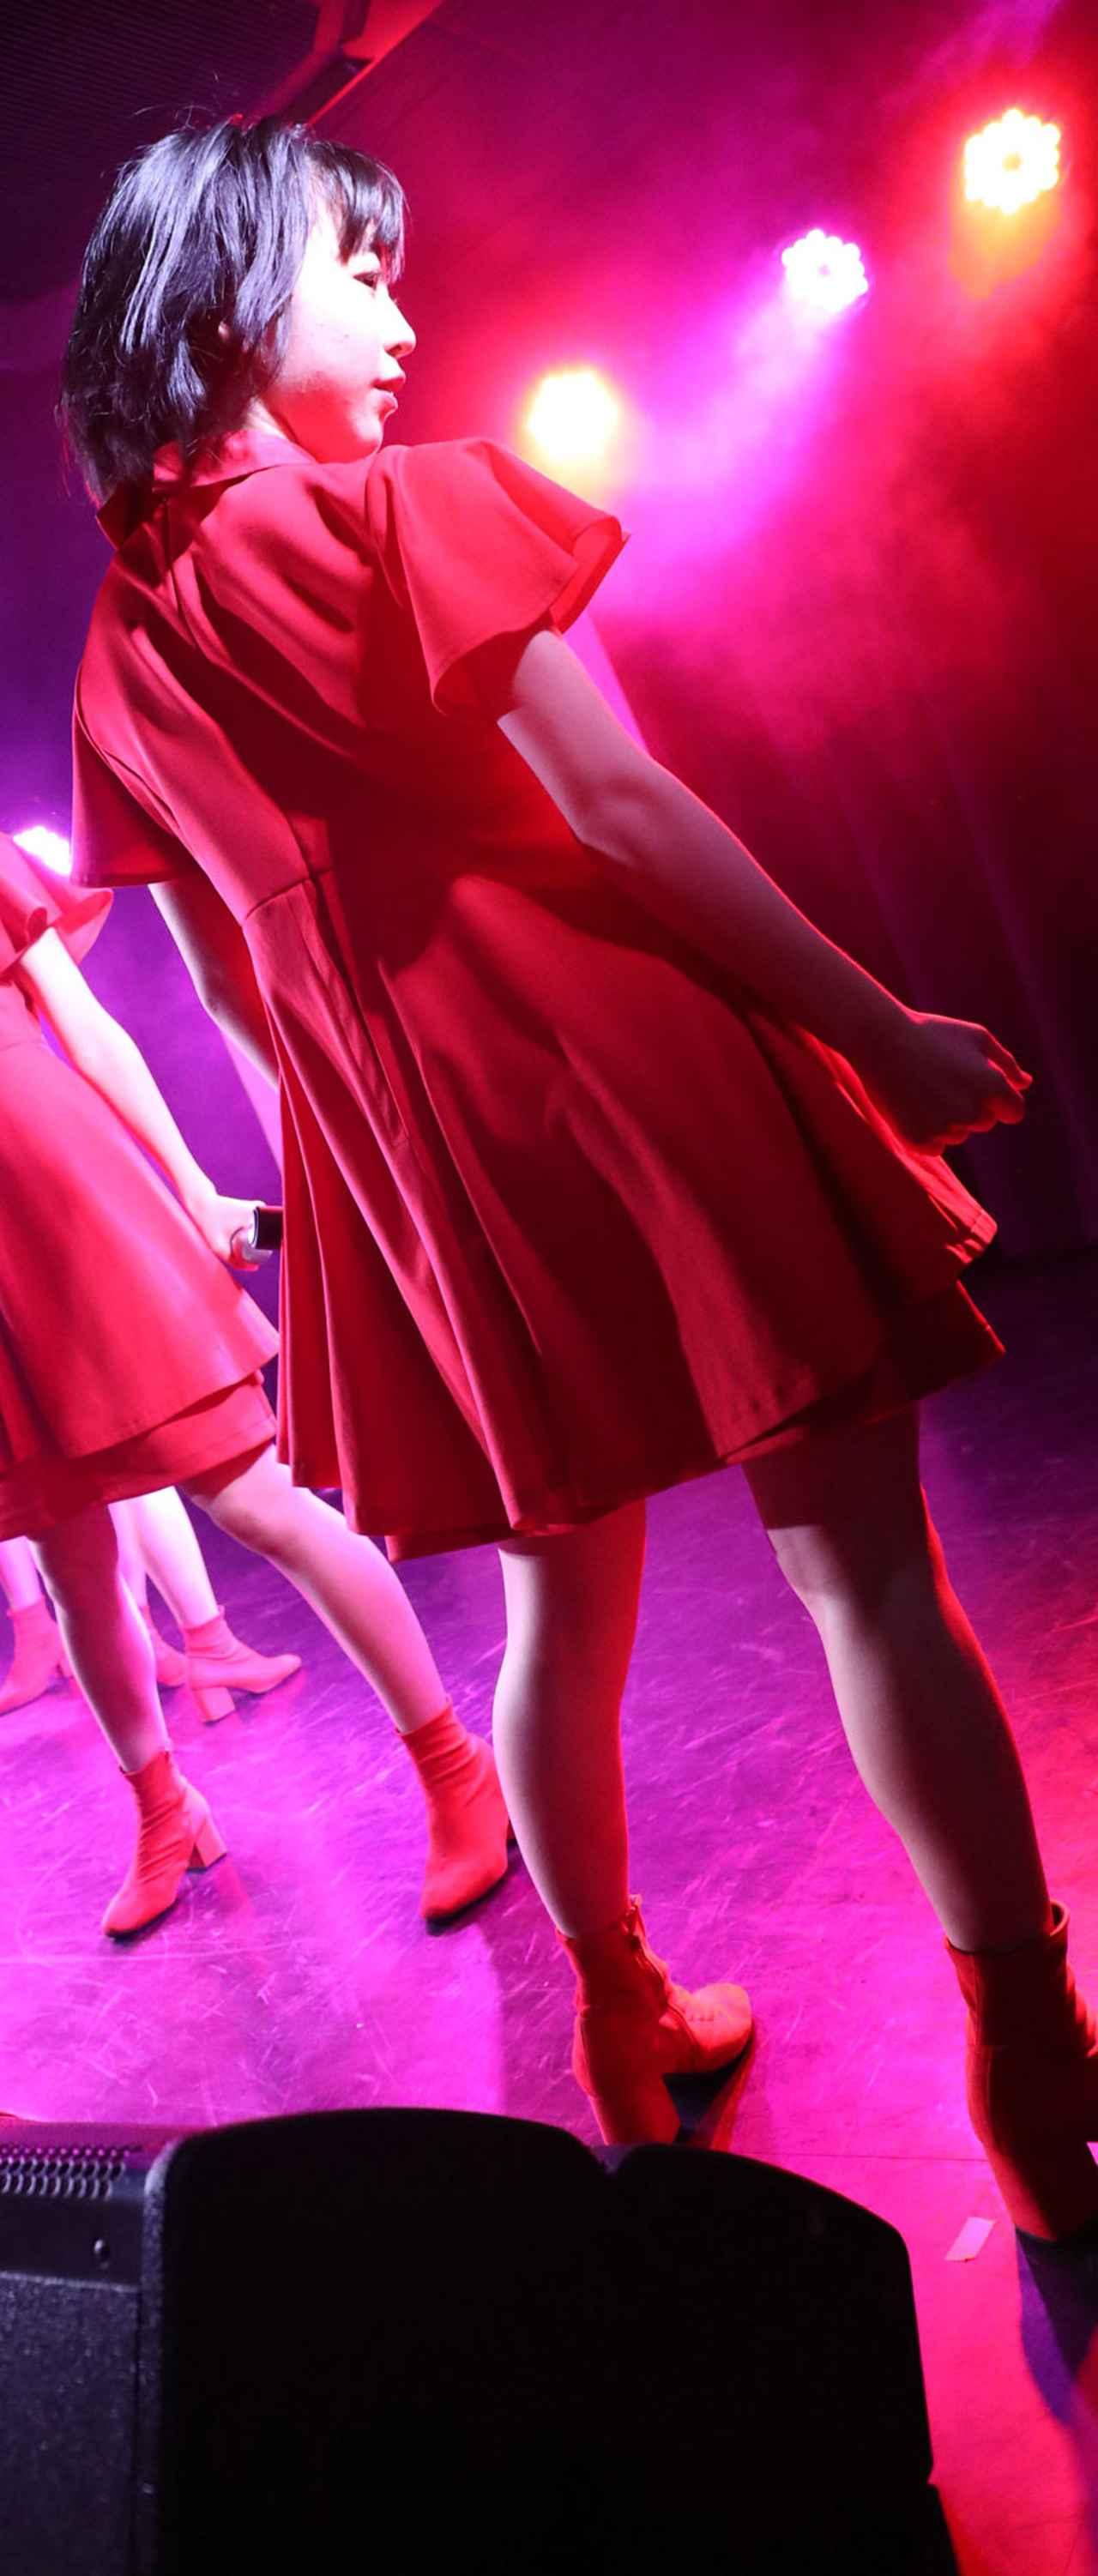 Images : 11番目の画像 - 九州女子翼 - Stereo Sound ONLINE